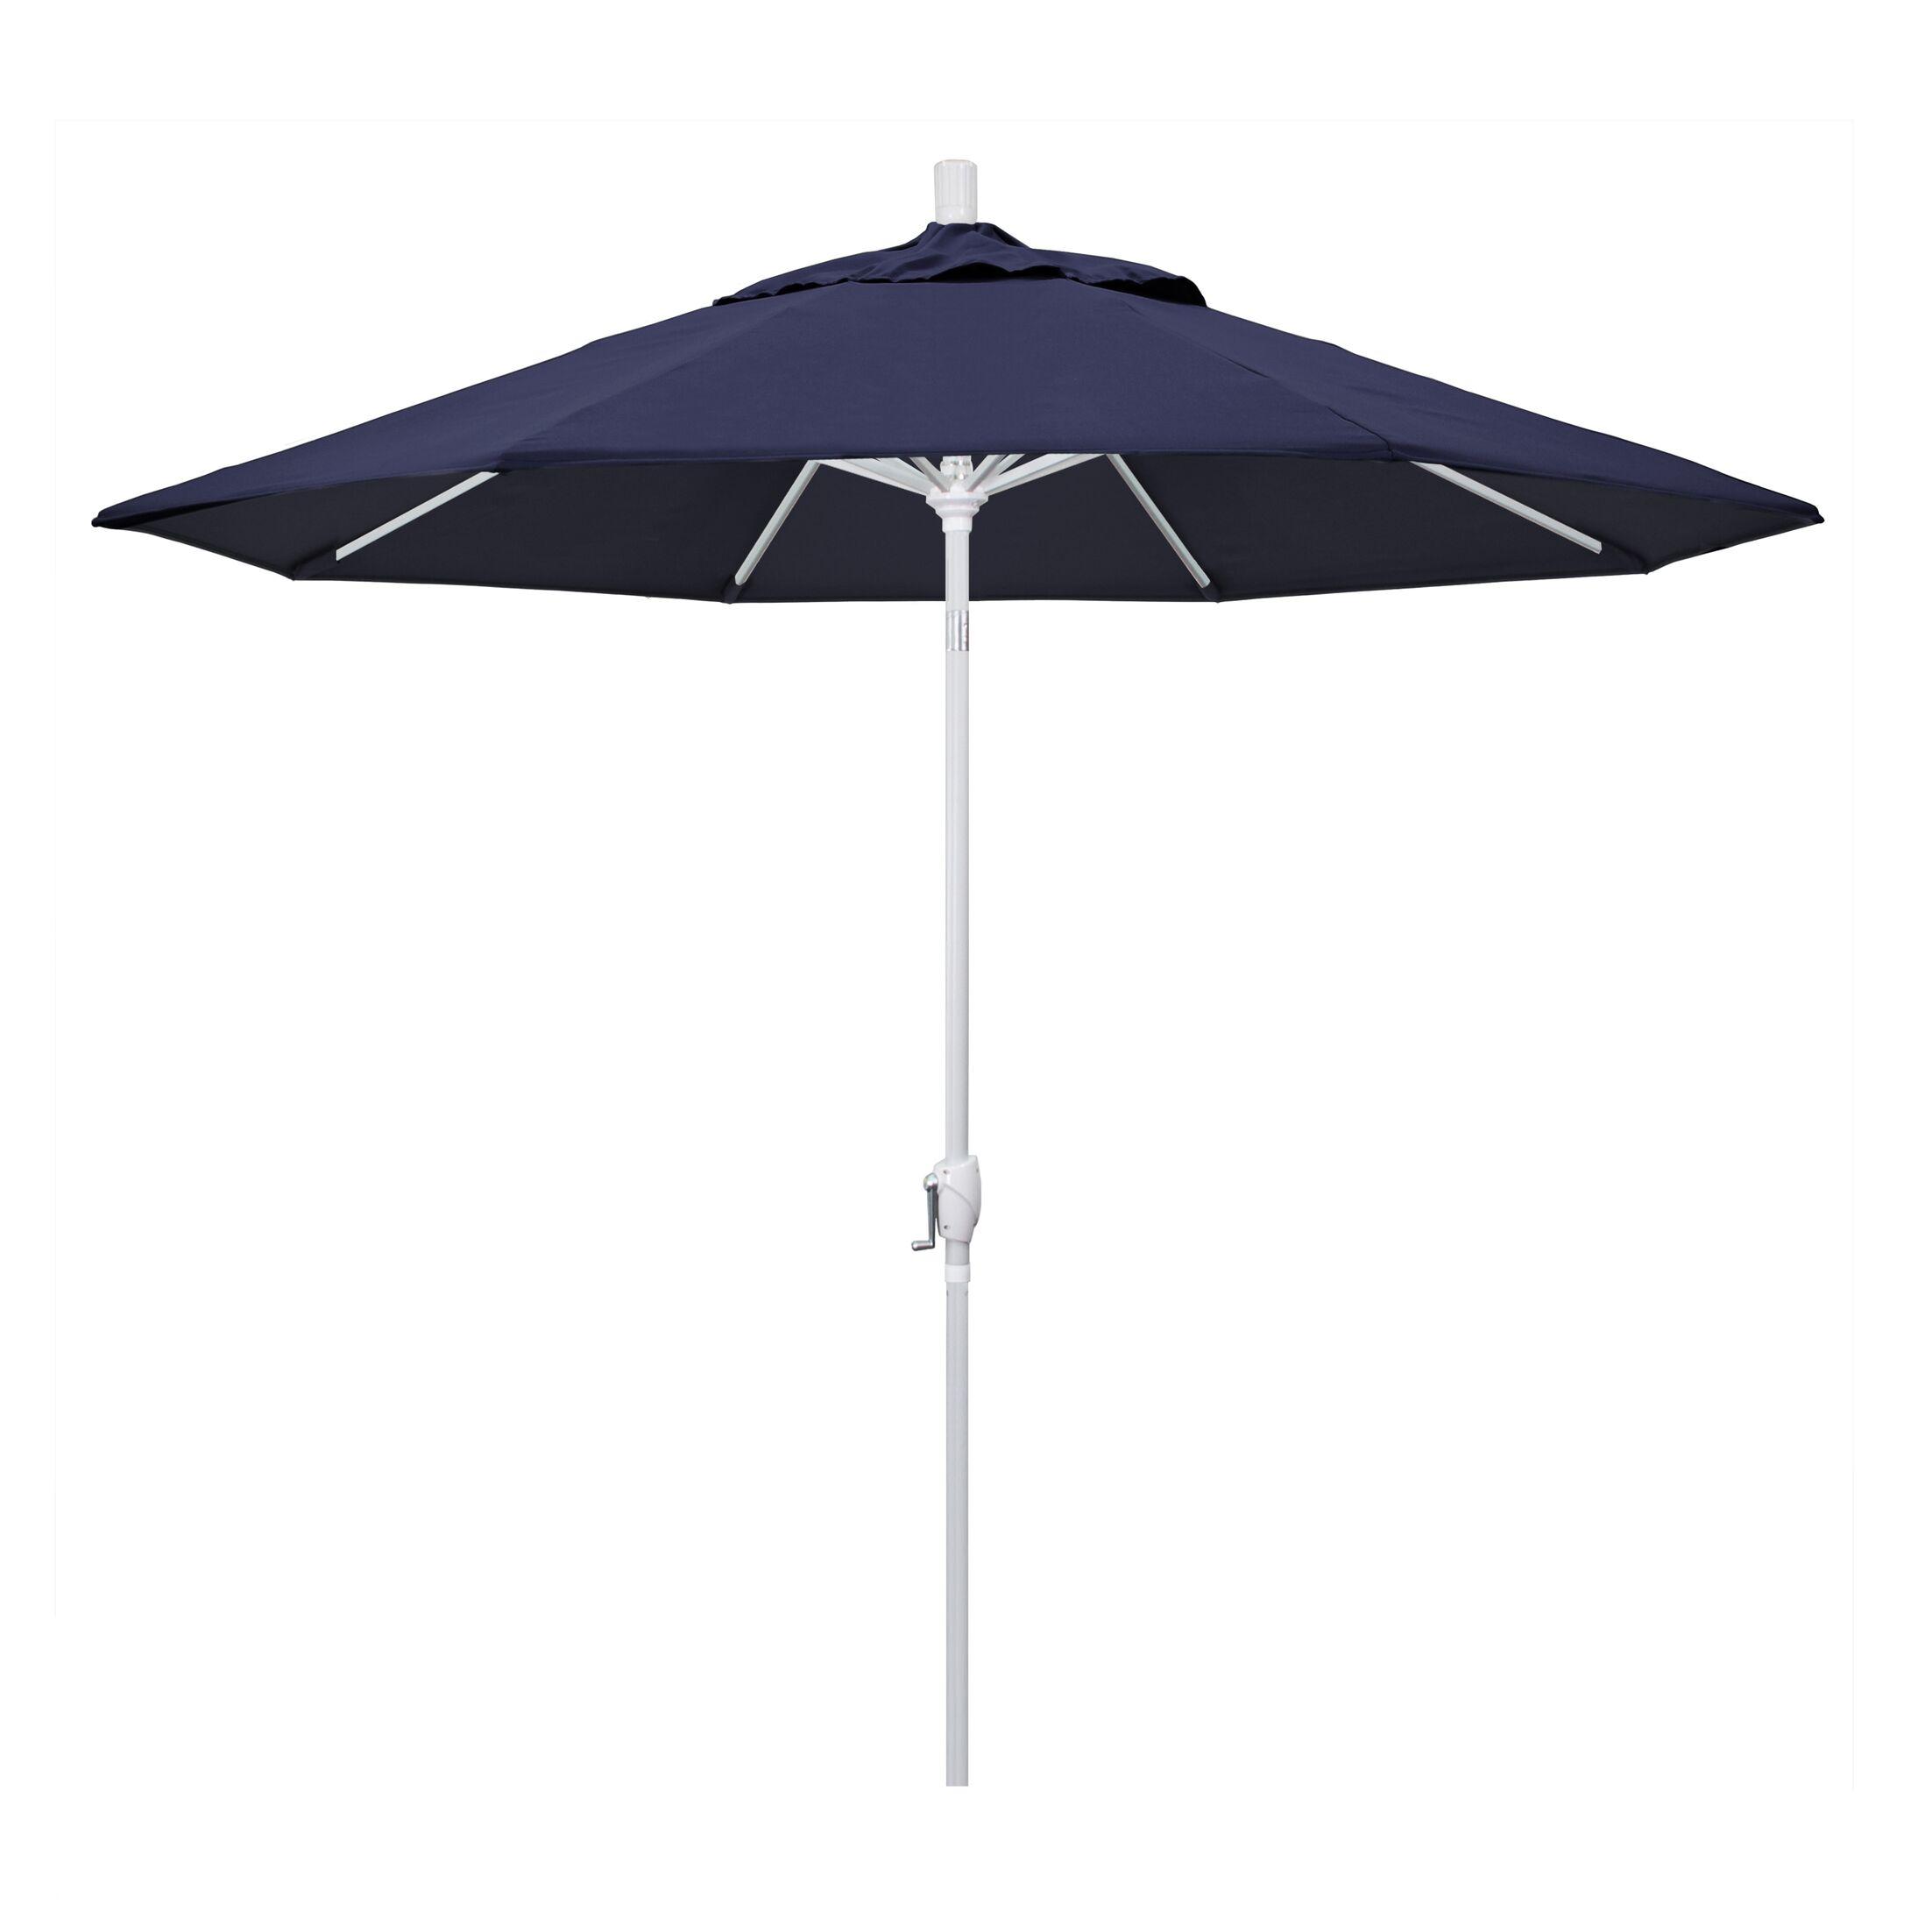 Cello 9' Market Umbrella Frame Finish: Matted White, Fabric: Navy